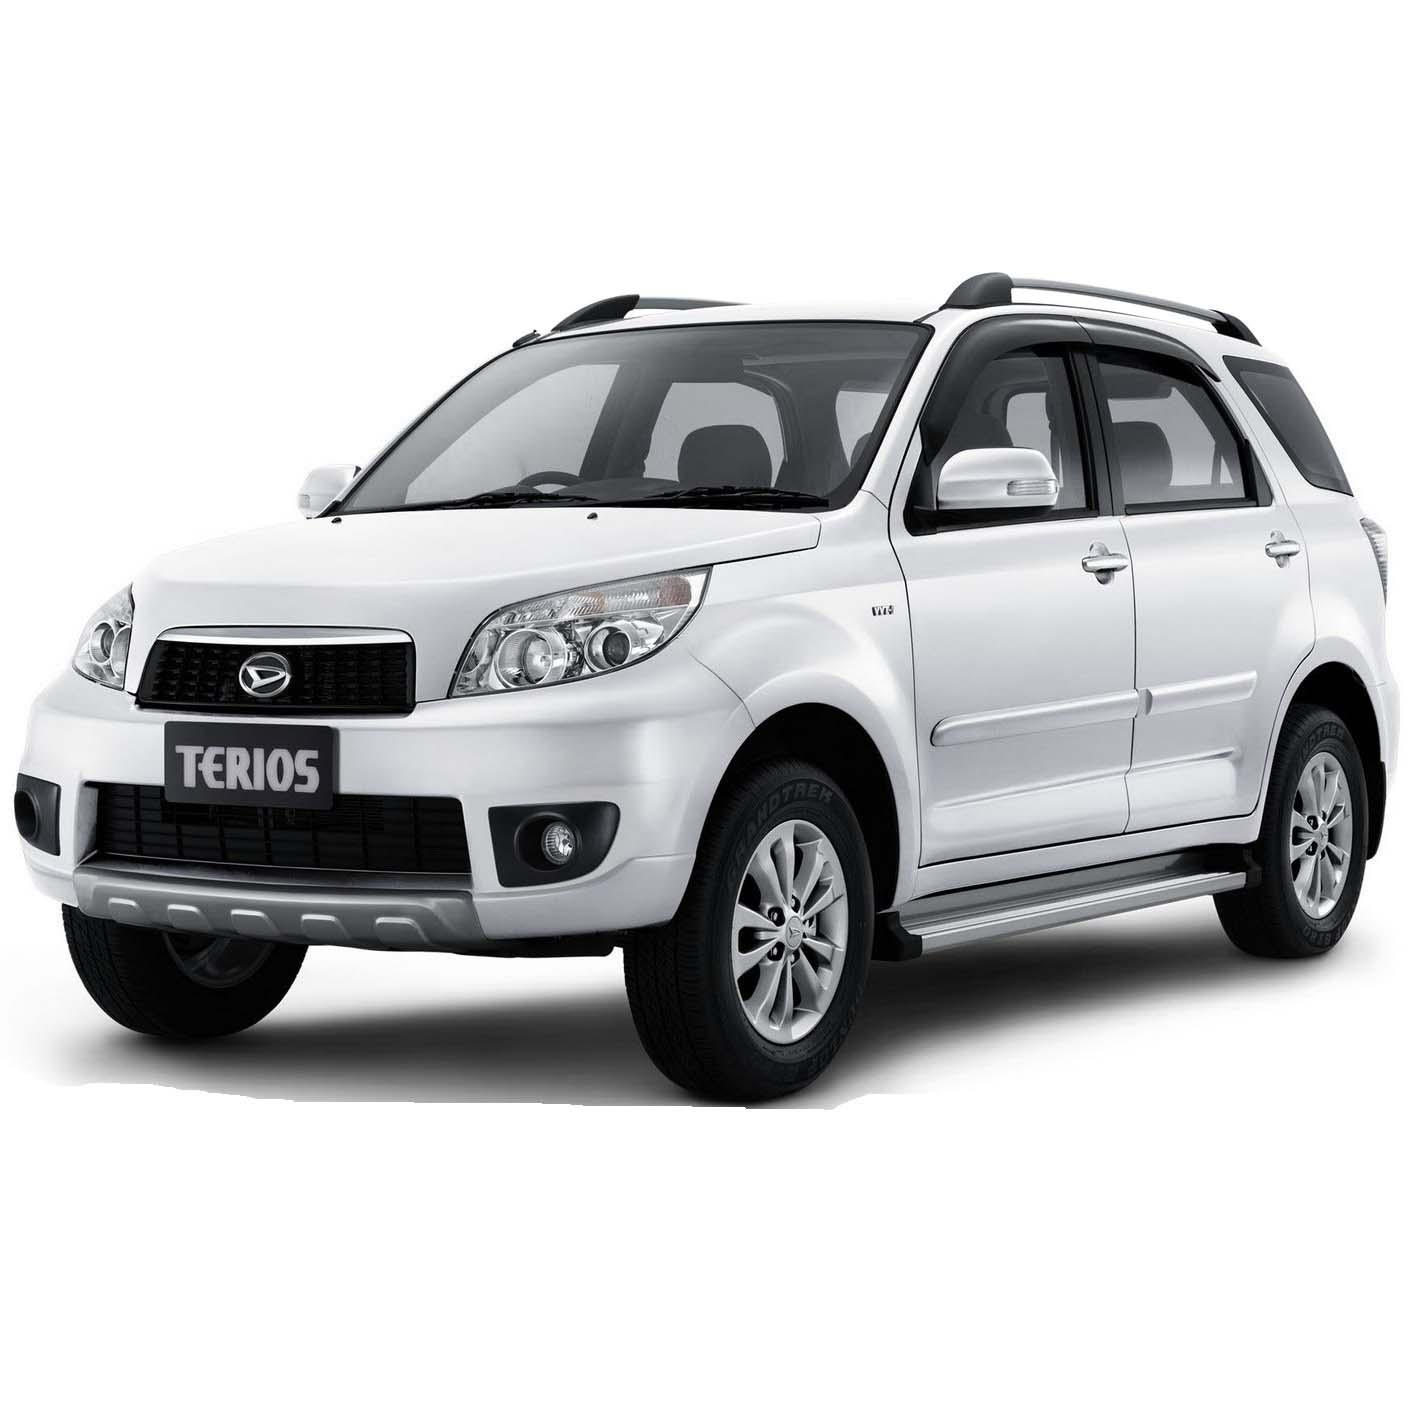 Daihatsu Terios 2006 - 2017